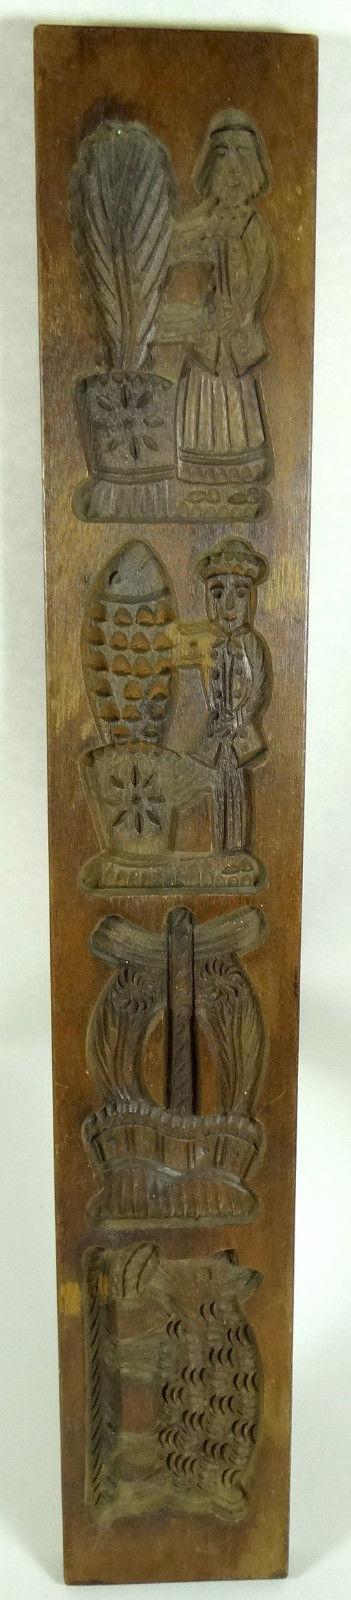 Antique Butter Mold Cookie Stamp Speculaas Springerle Folk Art RARE PIG Big 27